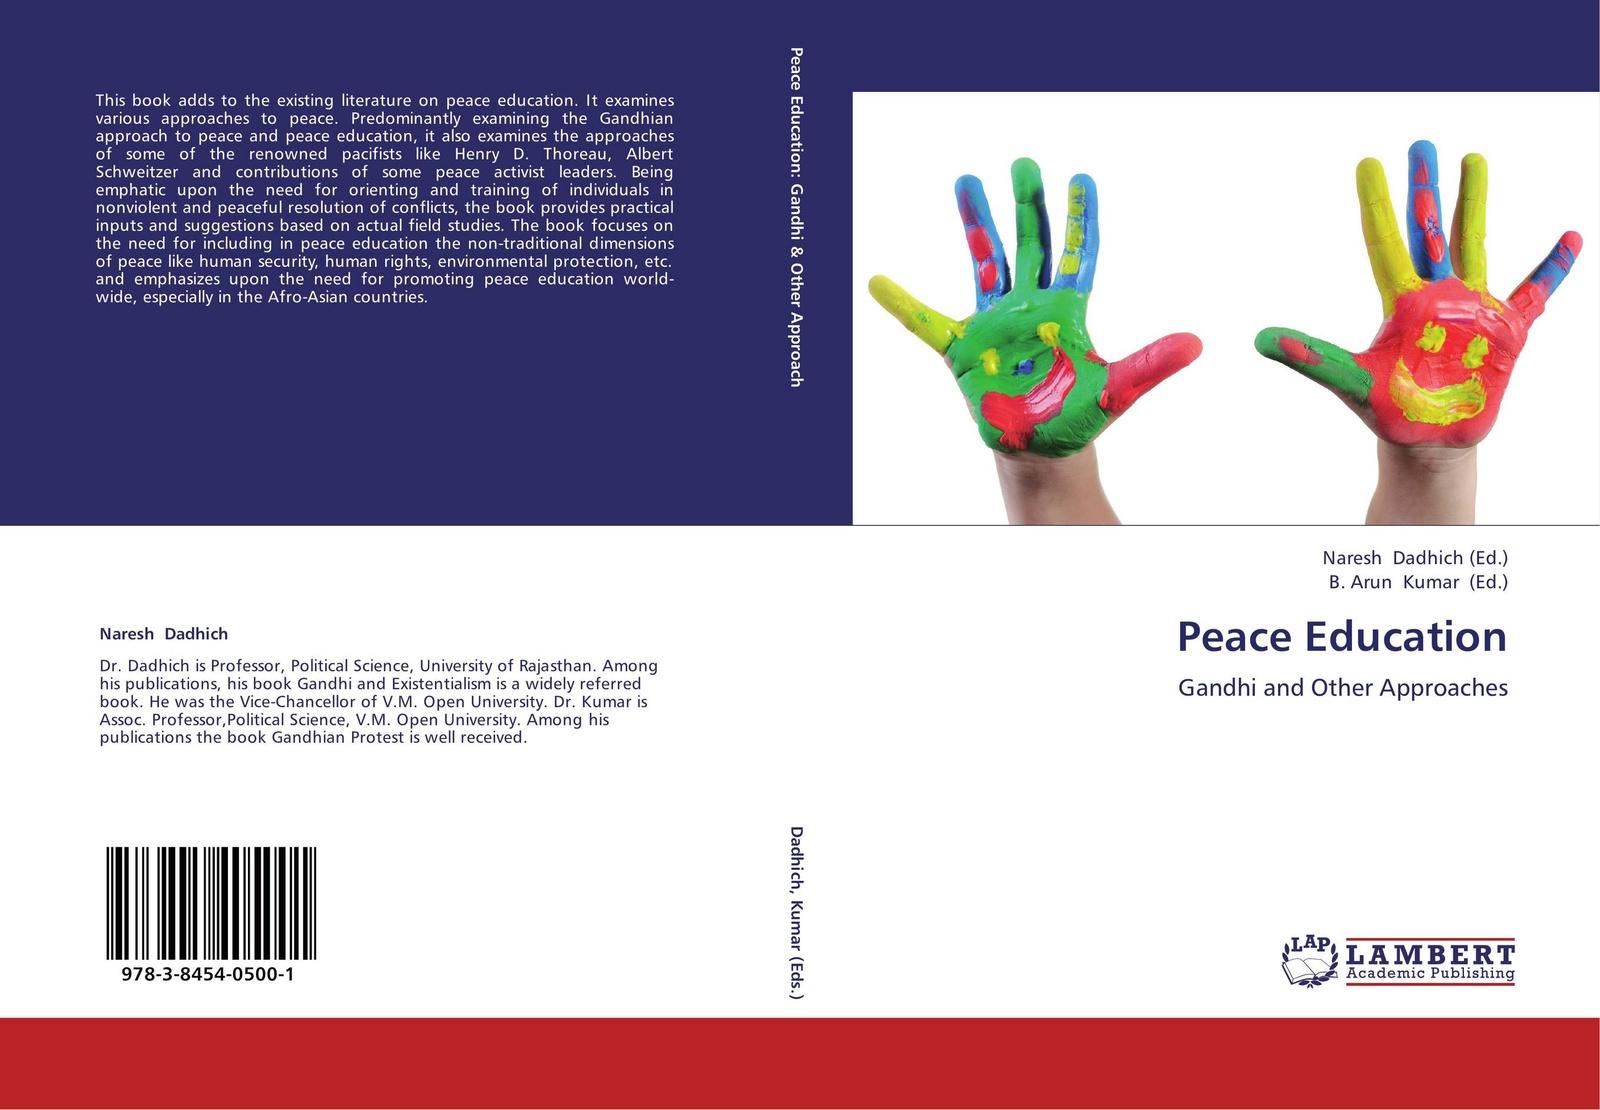 Naresh Dadhich and B. Arun Kumar Peace Education disturbing the peace